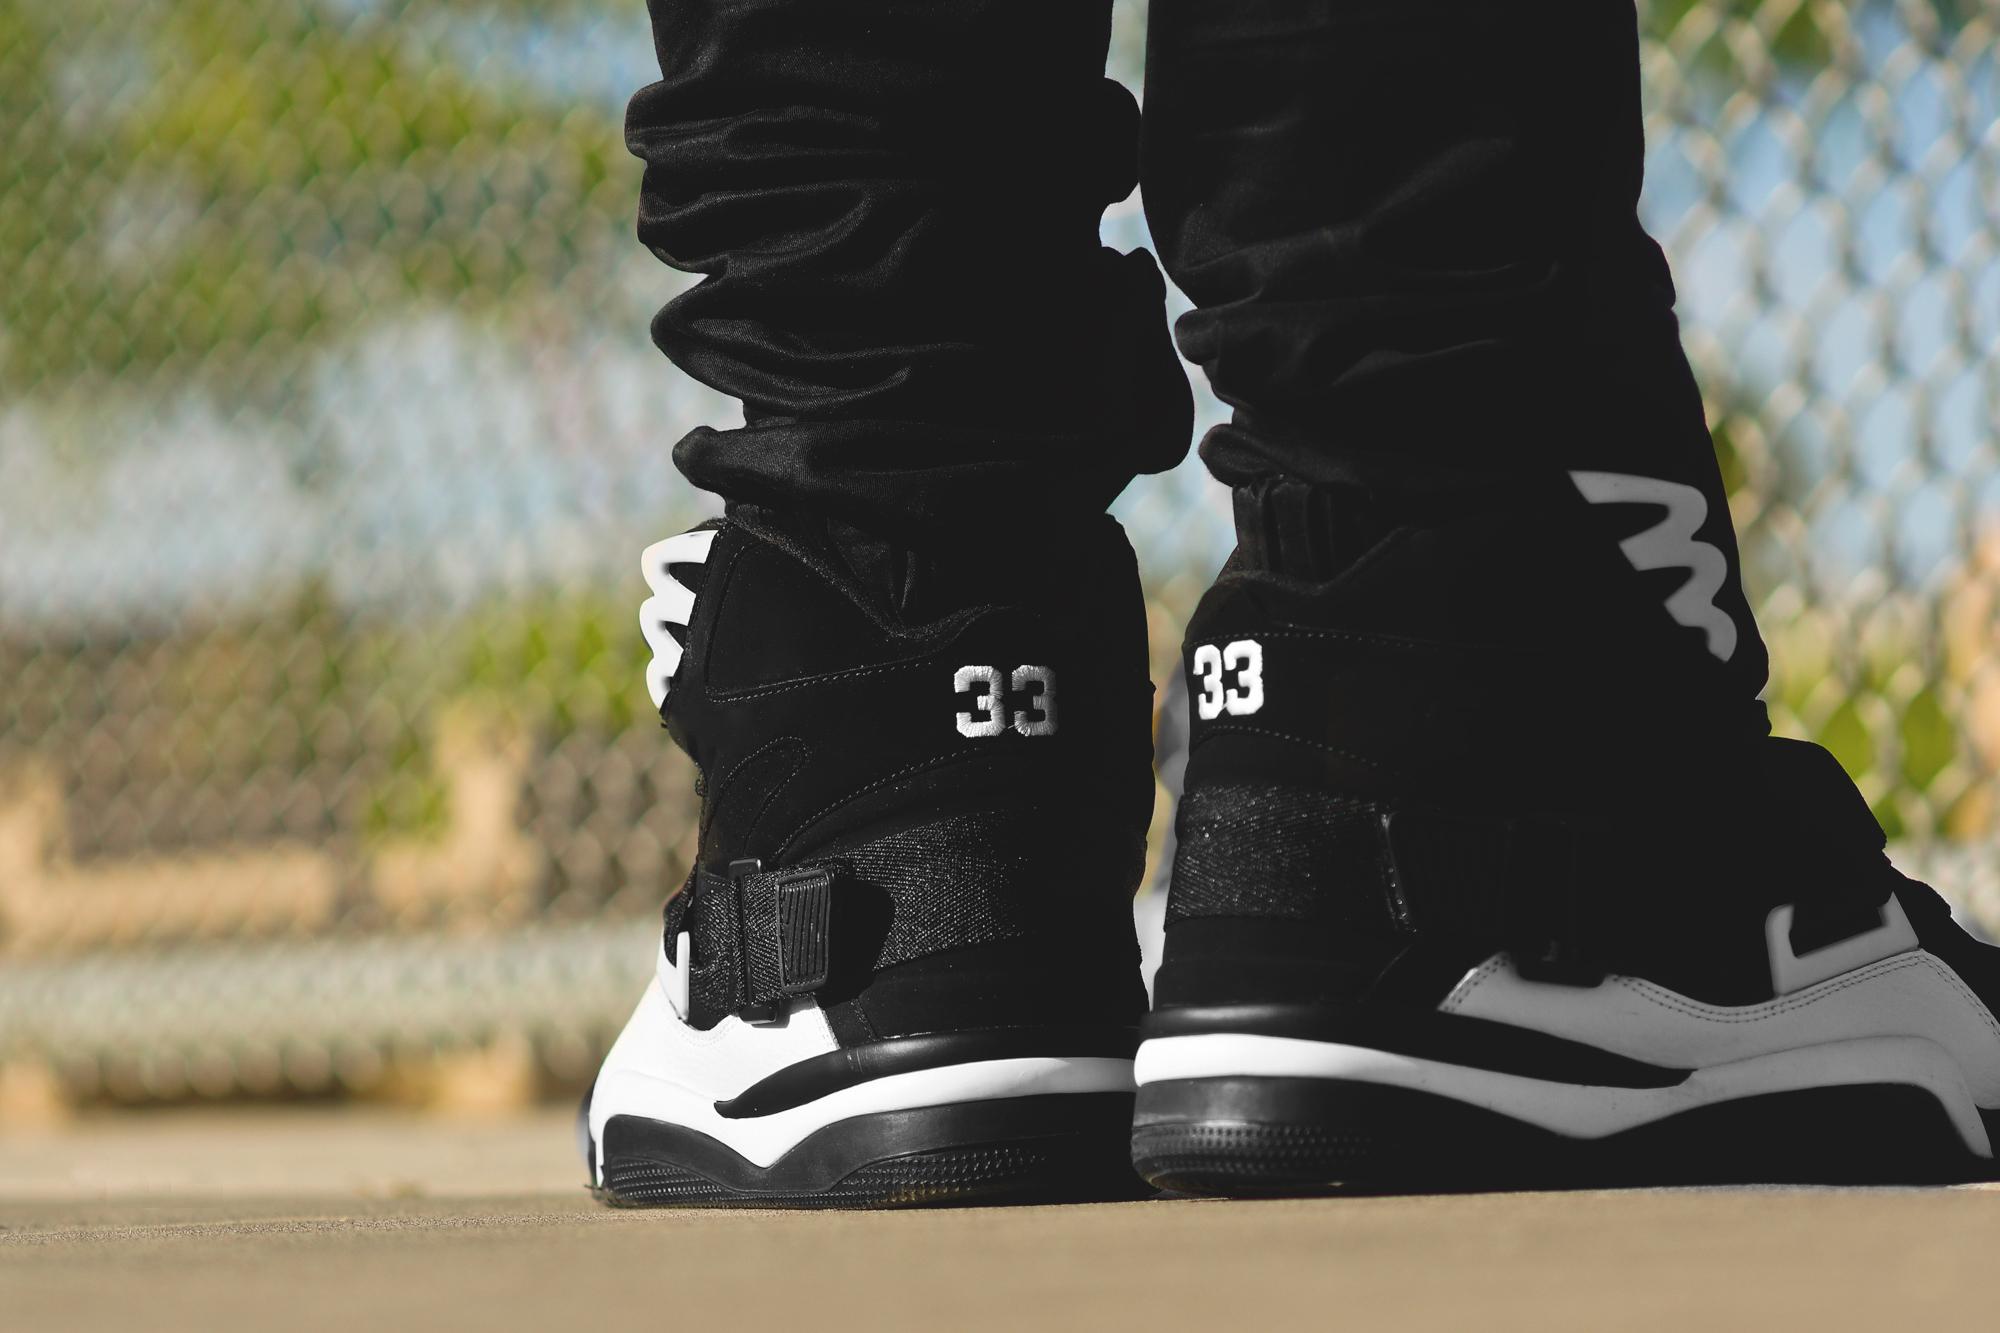 sports shoes c17d0 c17f8 Ewing Athletics Concept Black White On Feet .